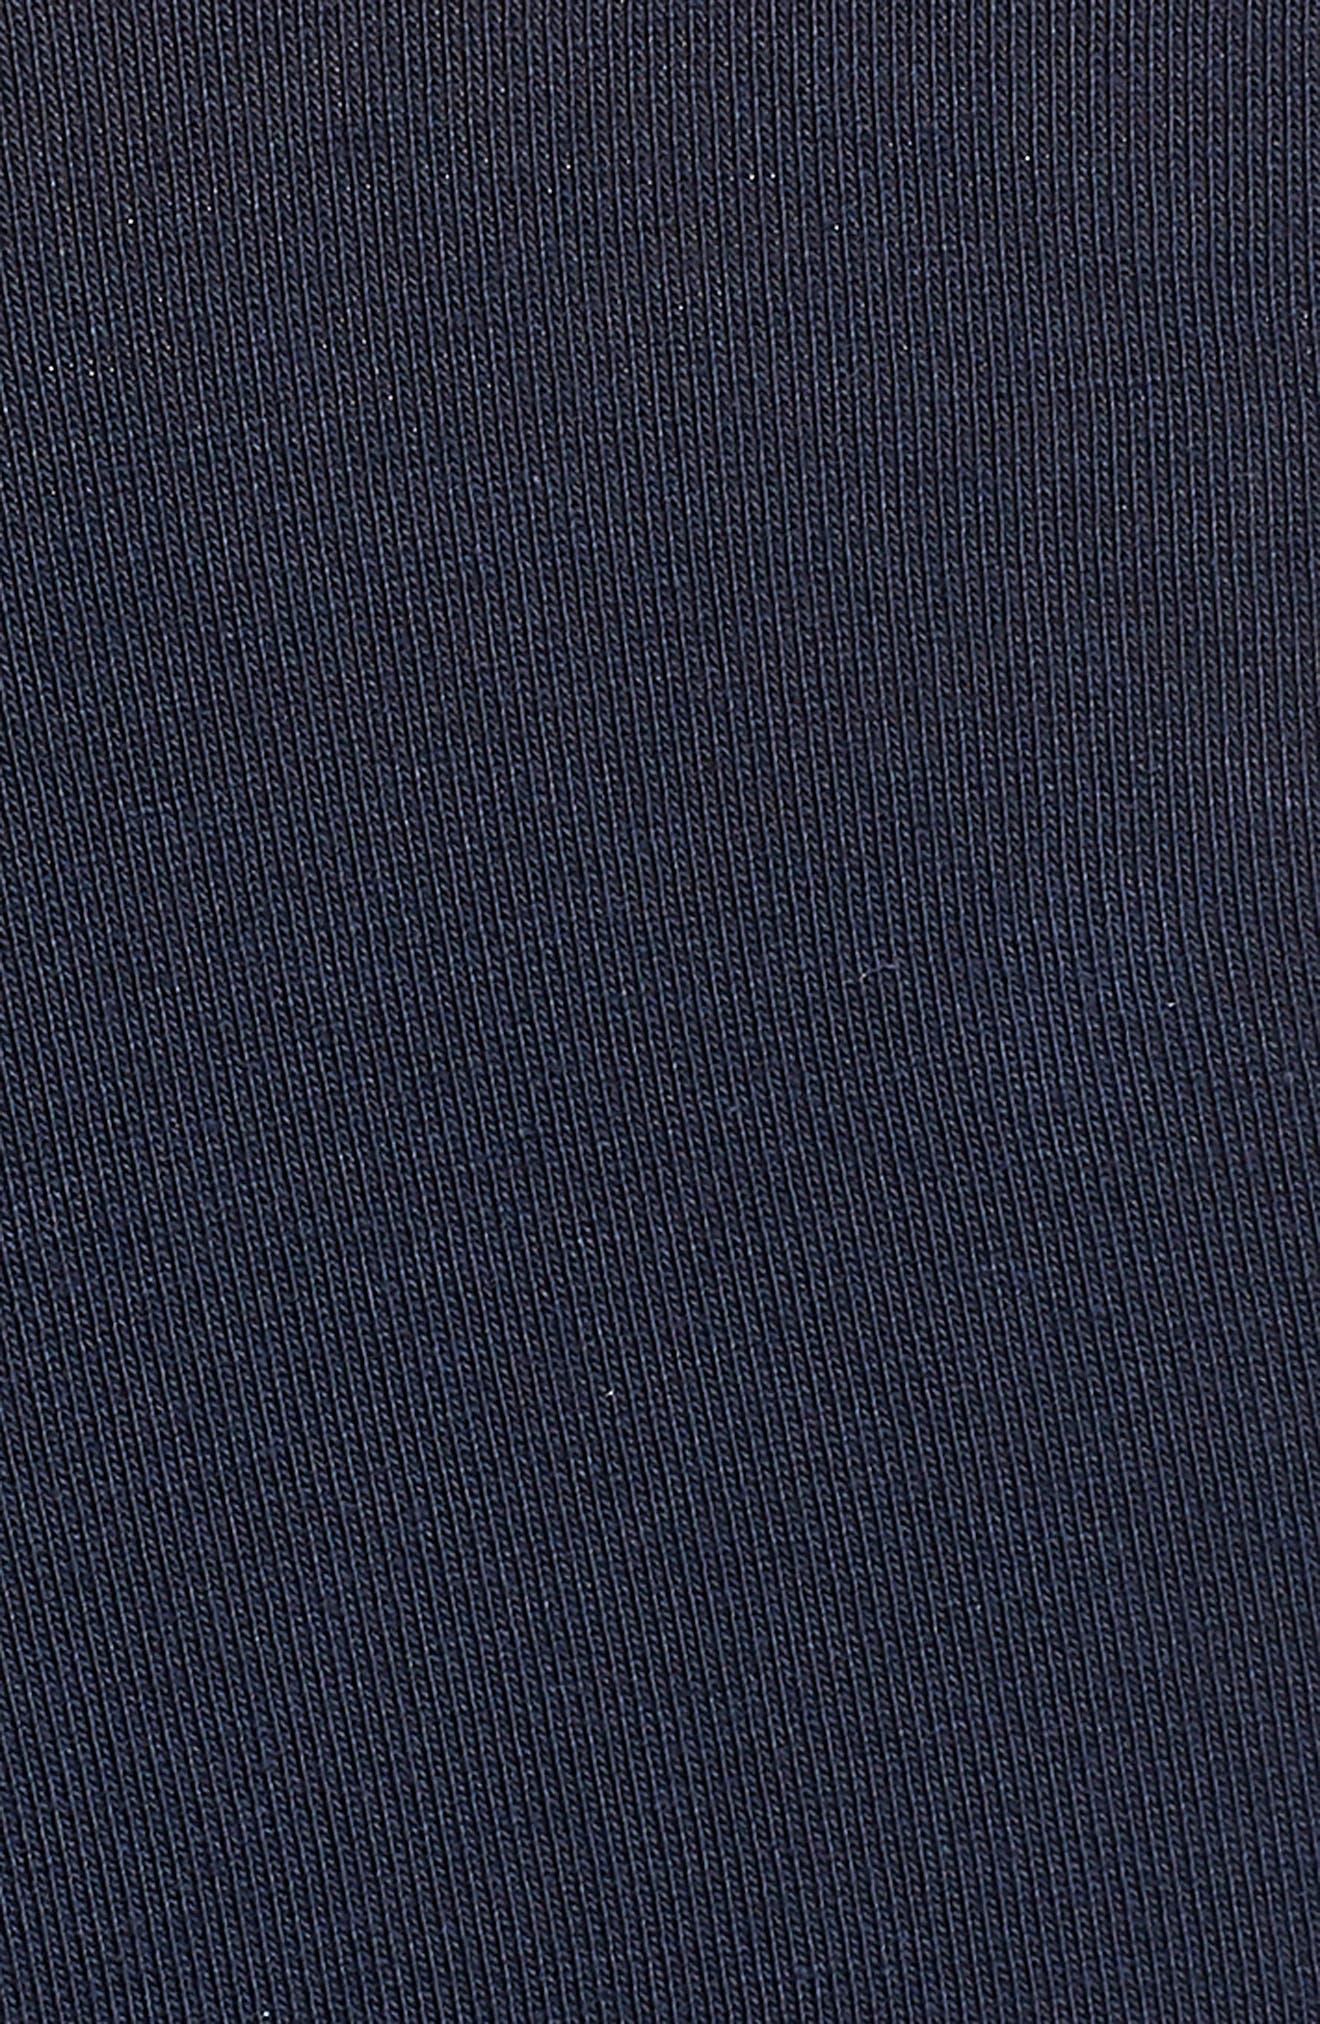 3-Pack Cotton Trunks,                             Alternate thumbnail 6, color,                             001